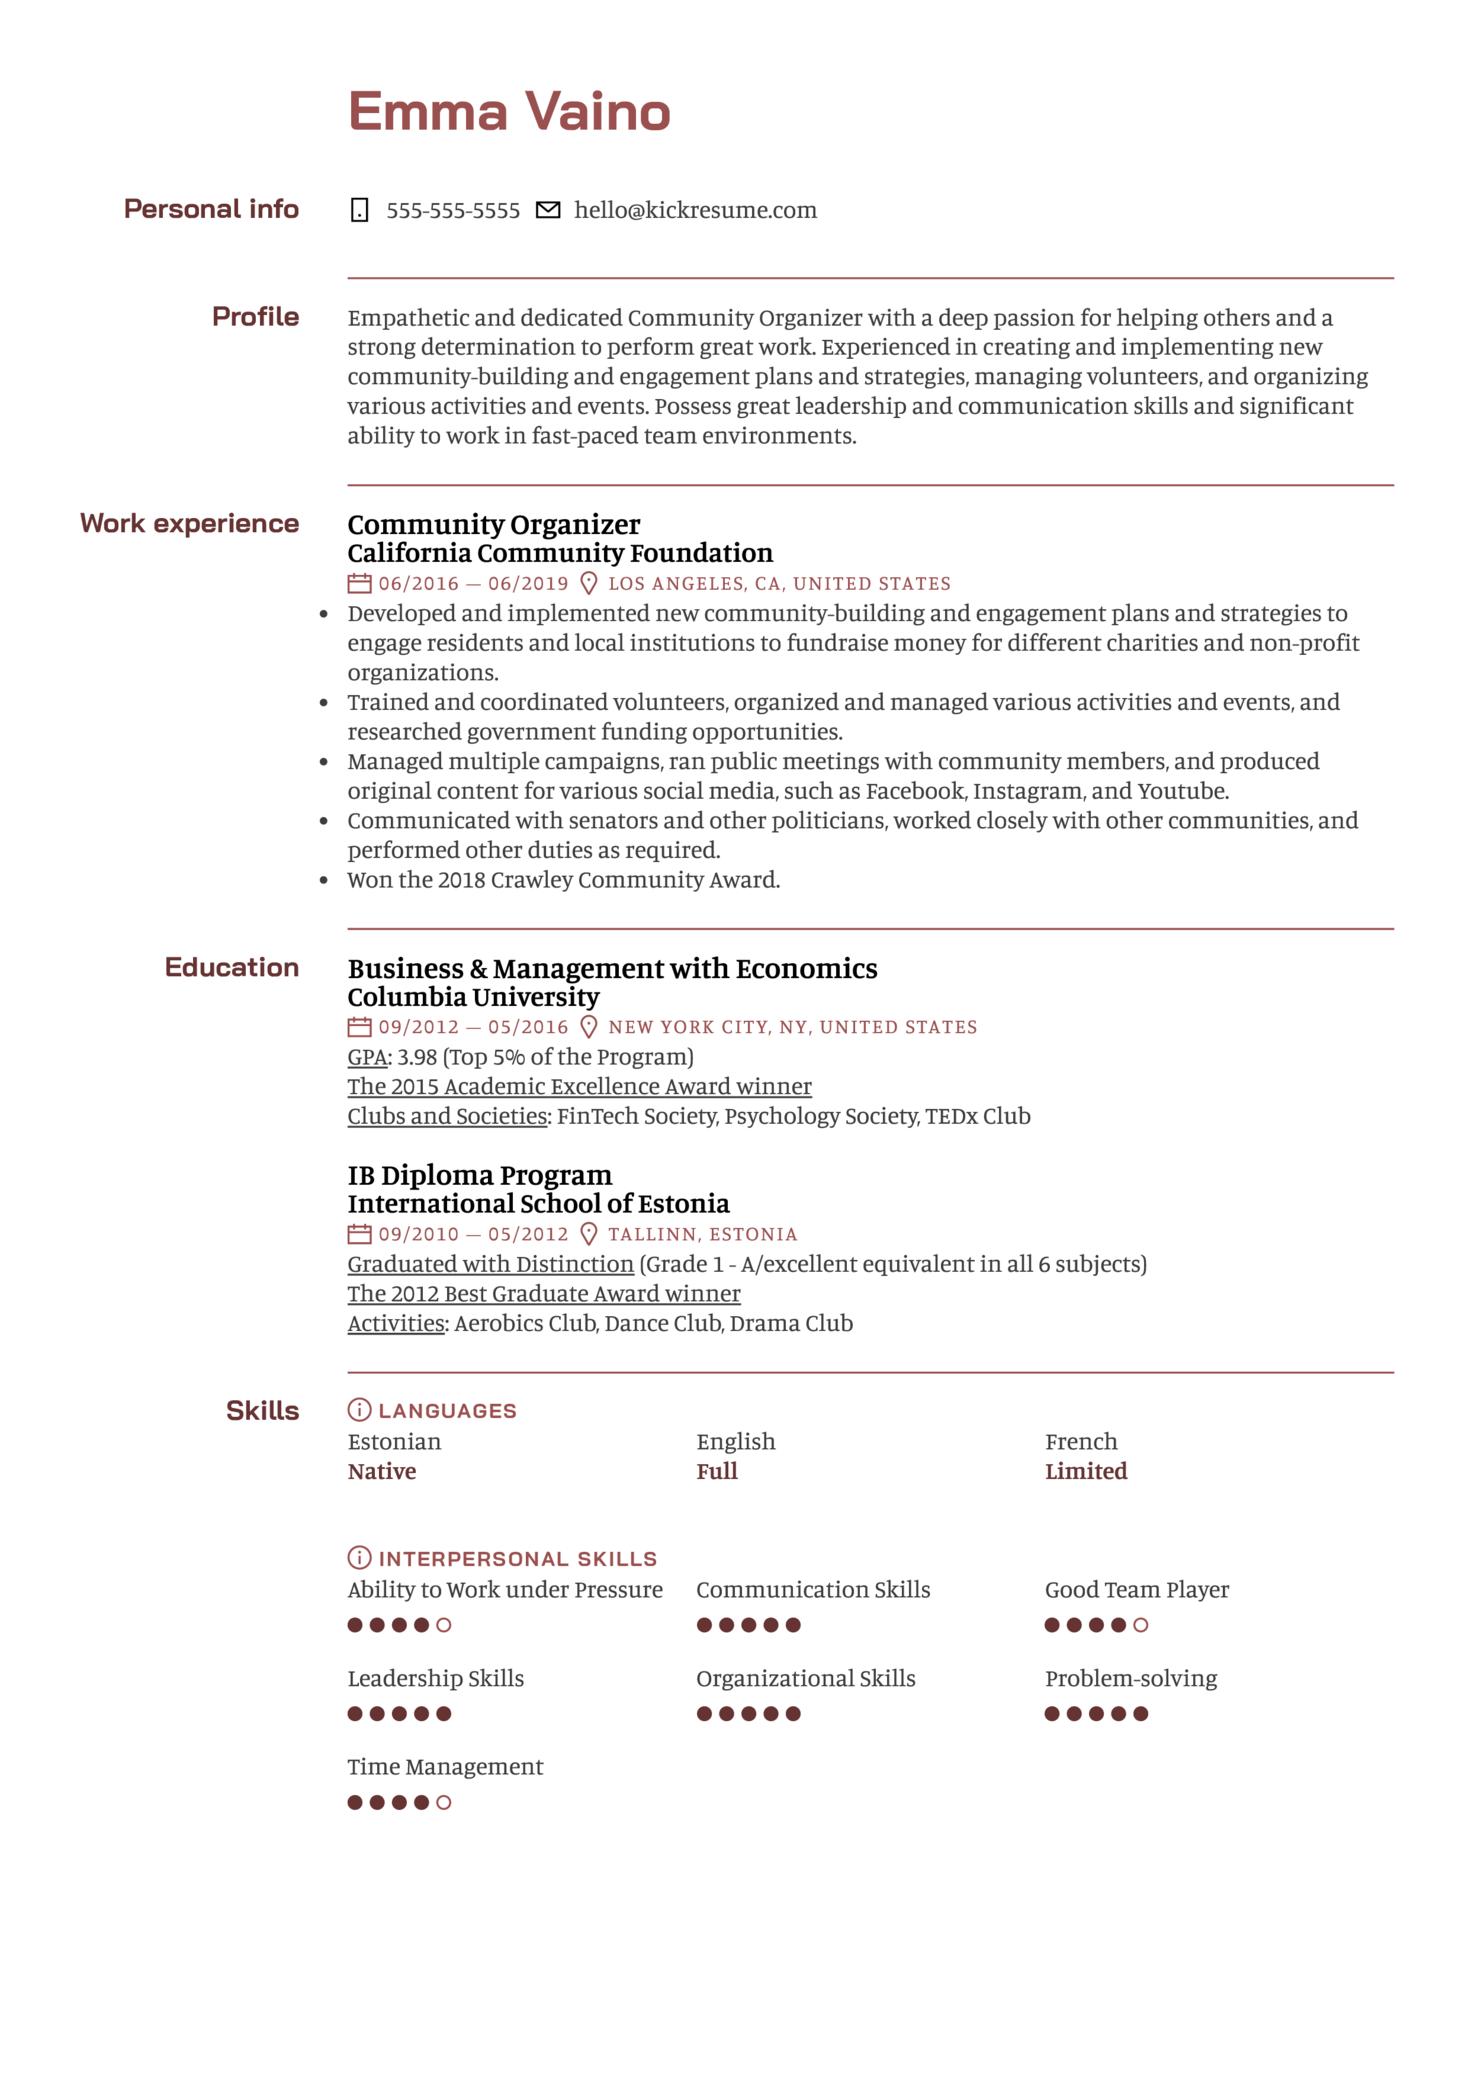 Community Organizer Resume Sample (parte 1)